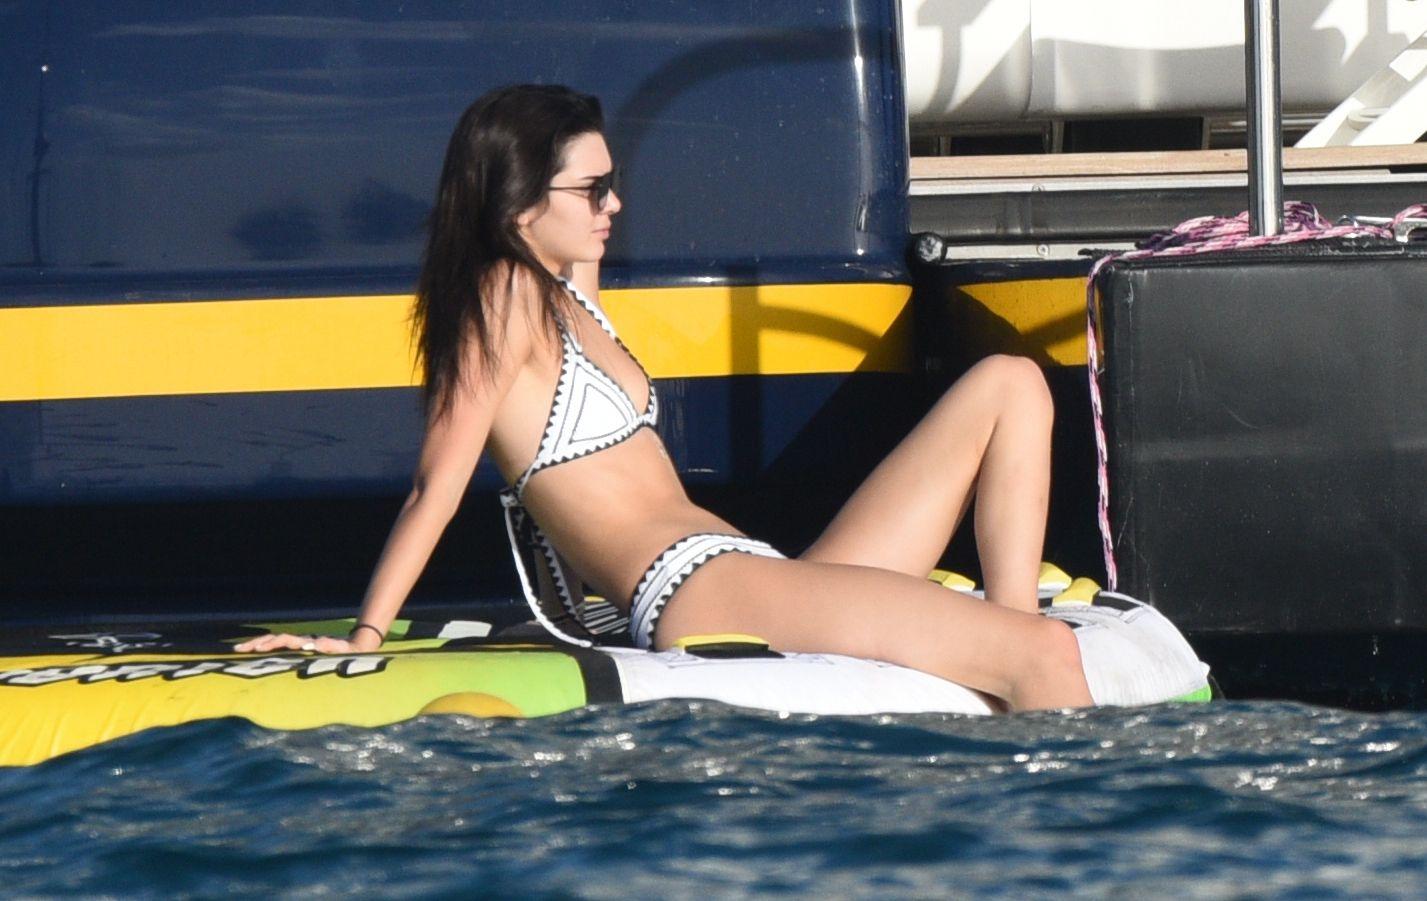 kendall-jenner-wearing-a-bikini-on-a-yacht-in-st-barts-07